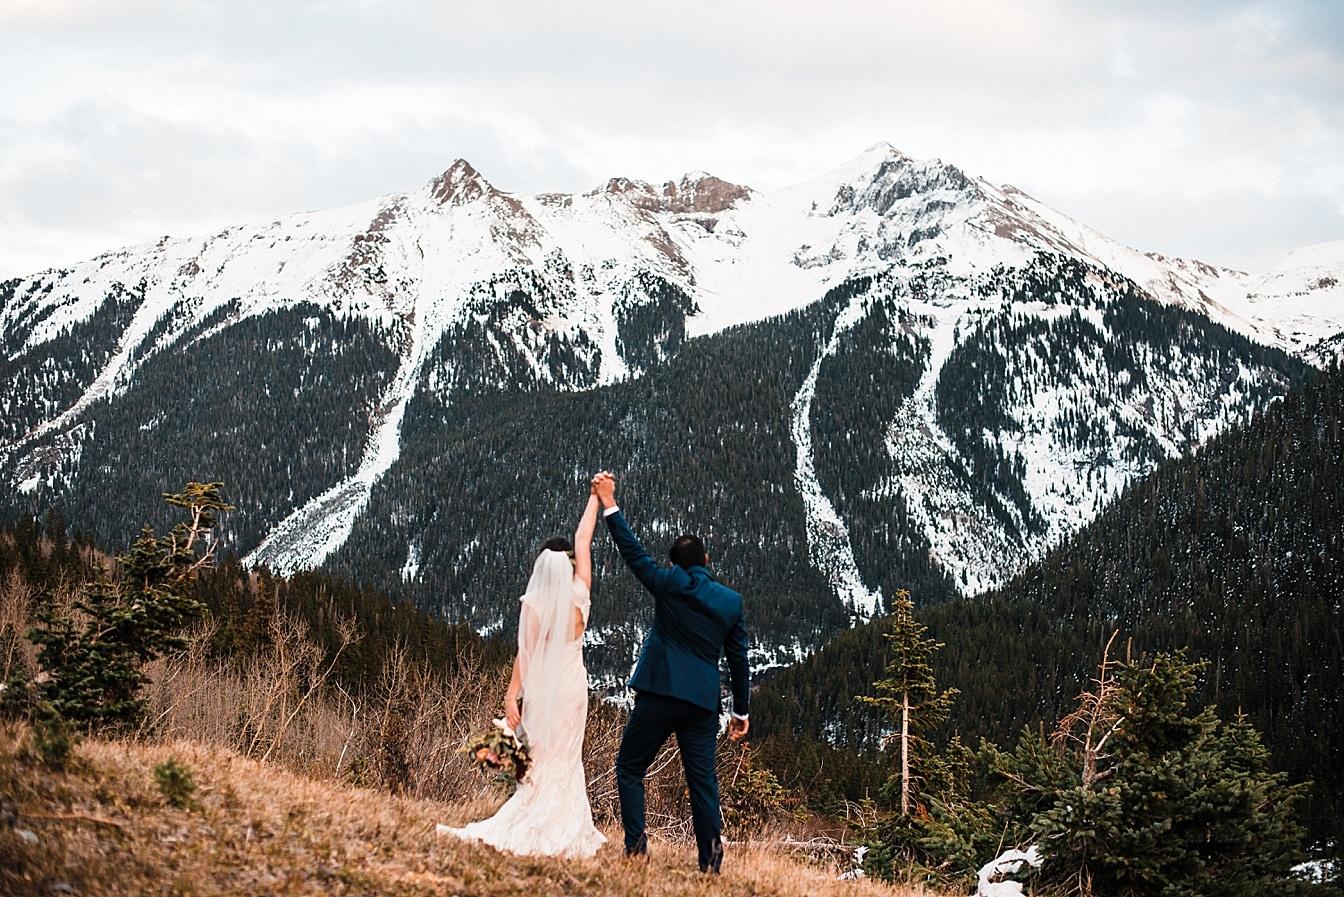 Colorado-Mountain-Elopement-Meredith-Humayun_0016.jpg